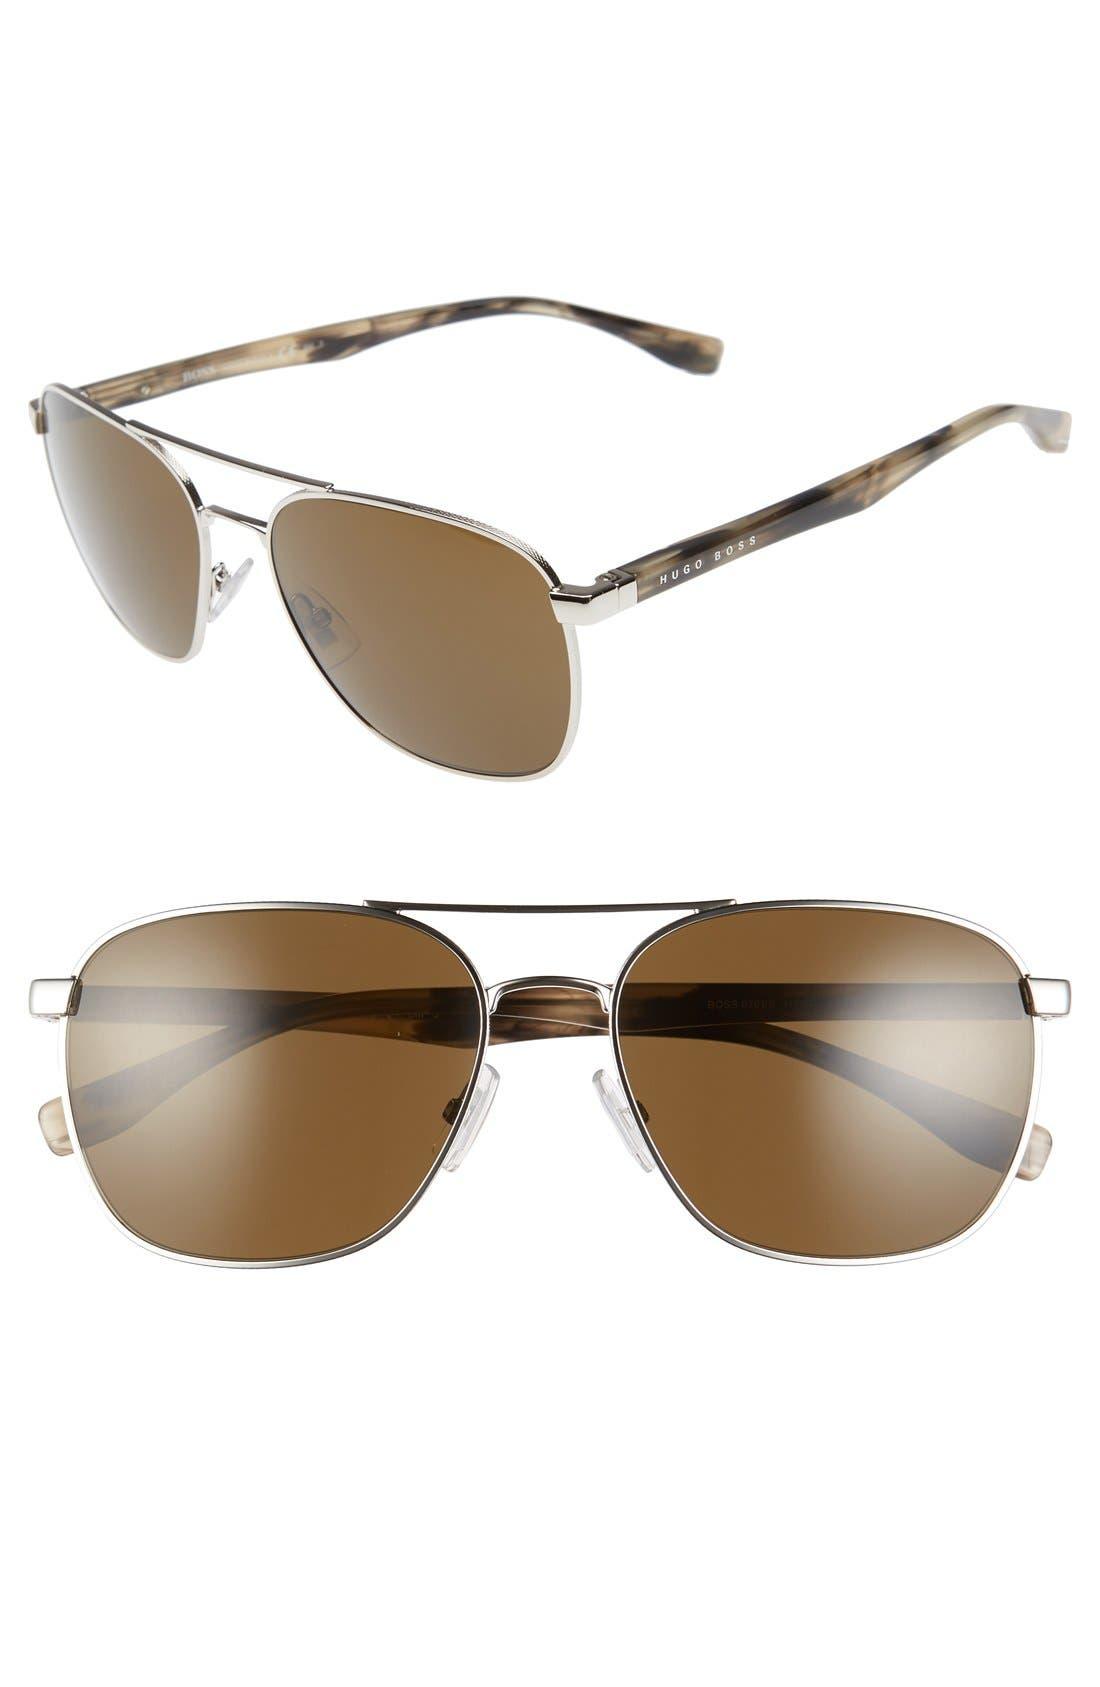 '0701/S' 57mm Aviator Sunglasses,                             Main thumbnail 1, color,                             211